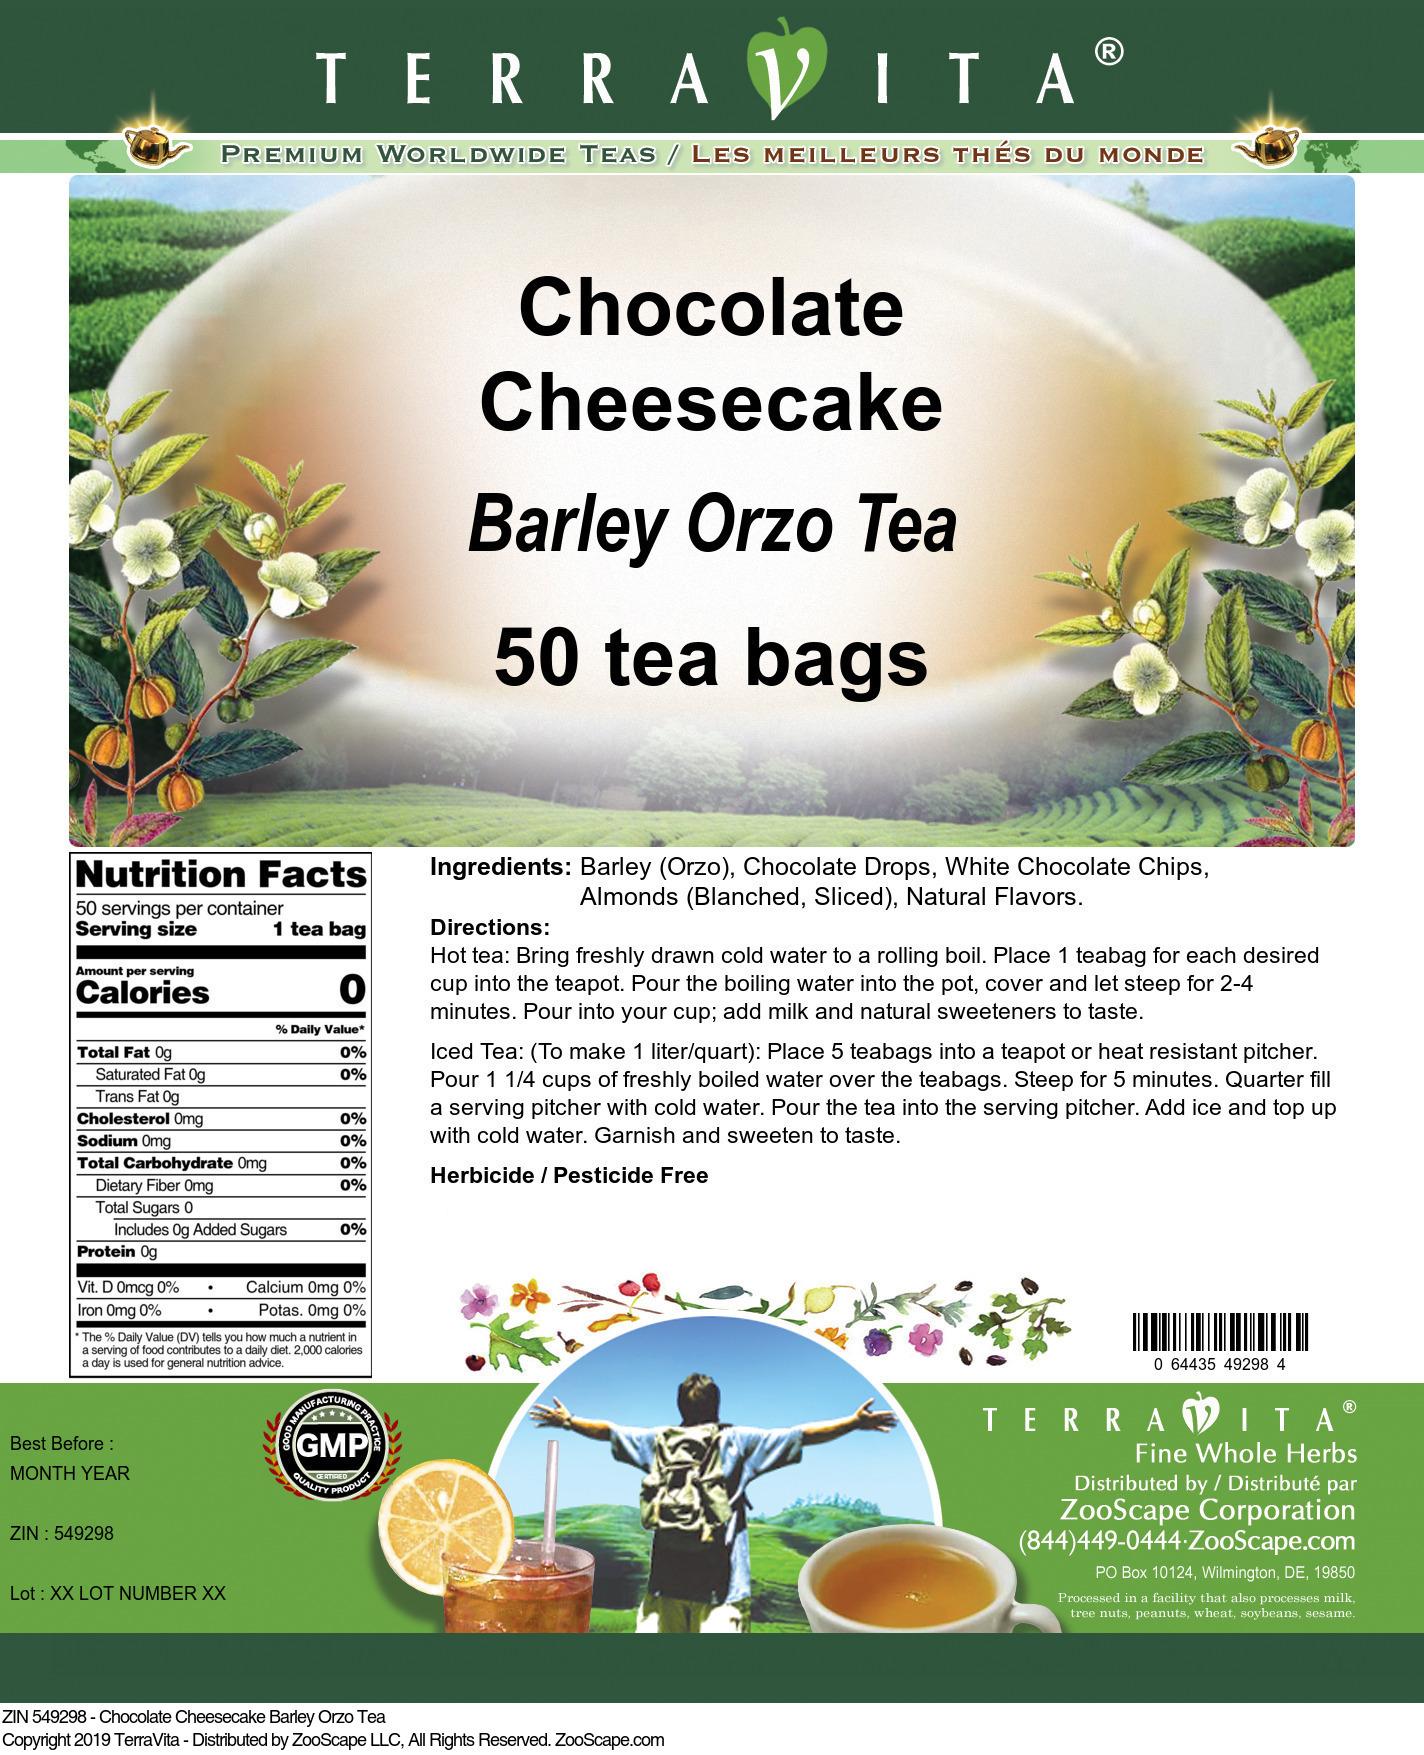 Chocolate Cheesecake Barley Orzo Tea